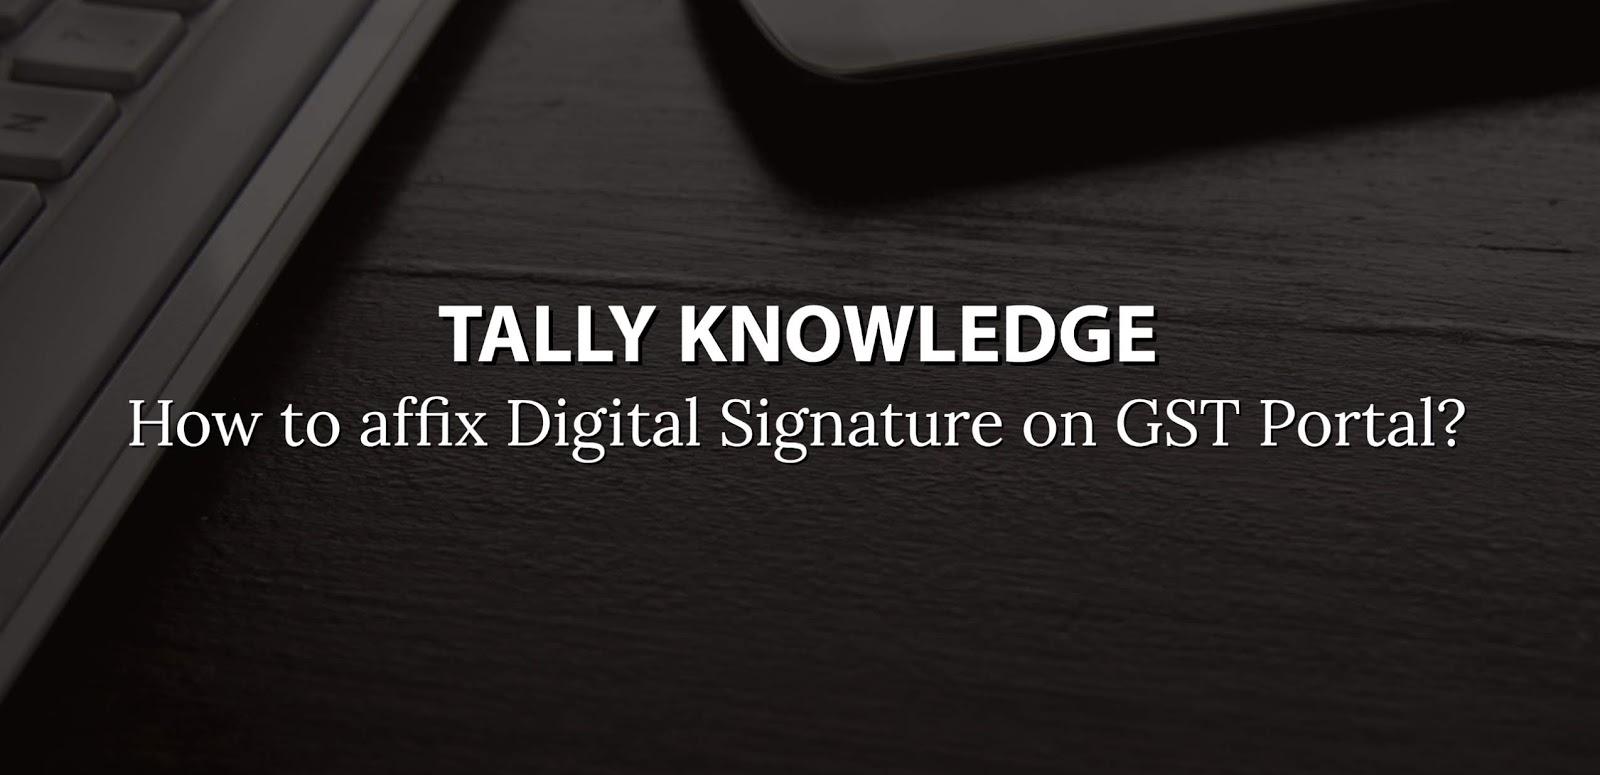 How to affix digital signature on GST Website